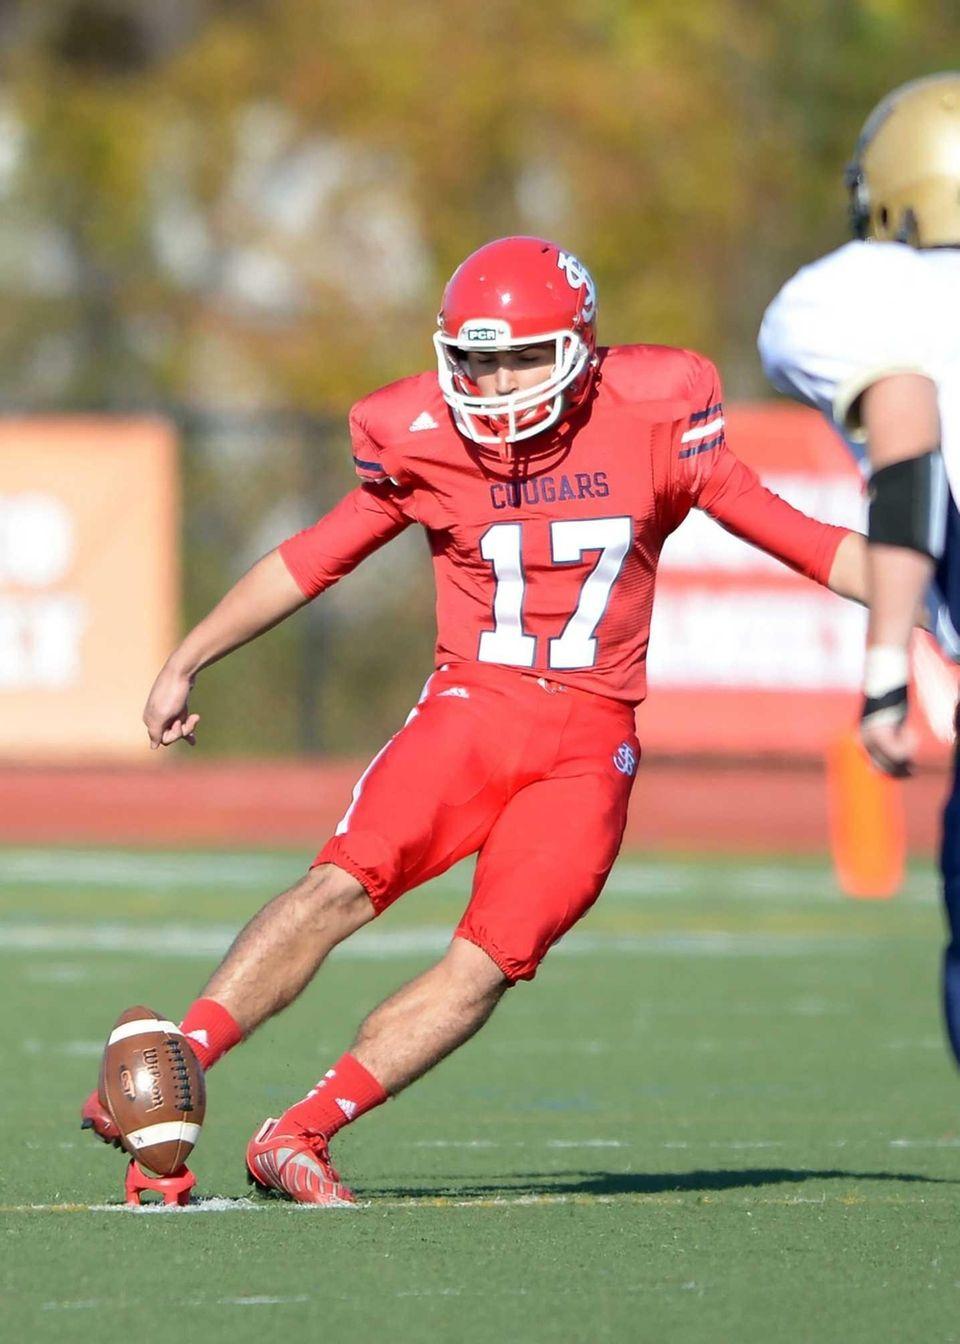 St. John's Nicholas Malderella (17) kicks off to